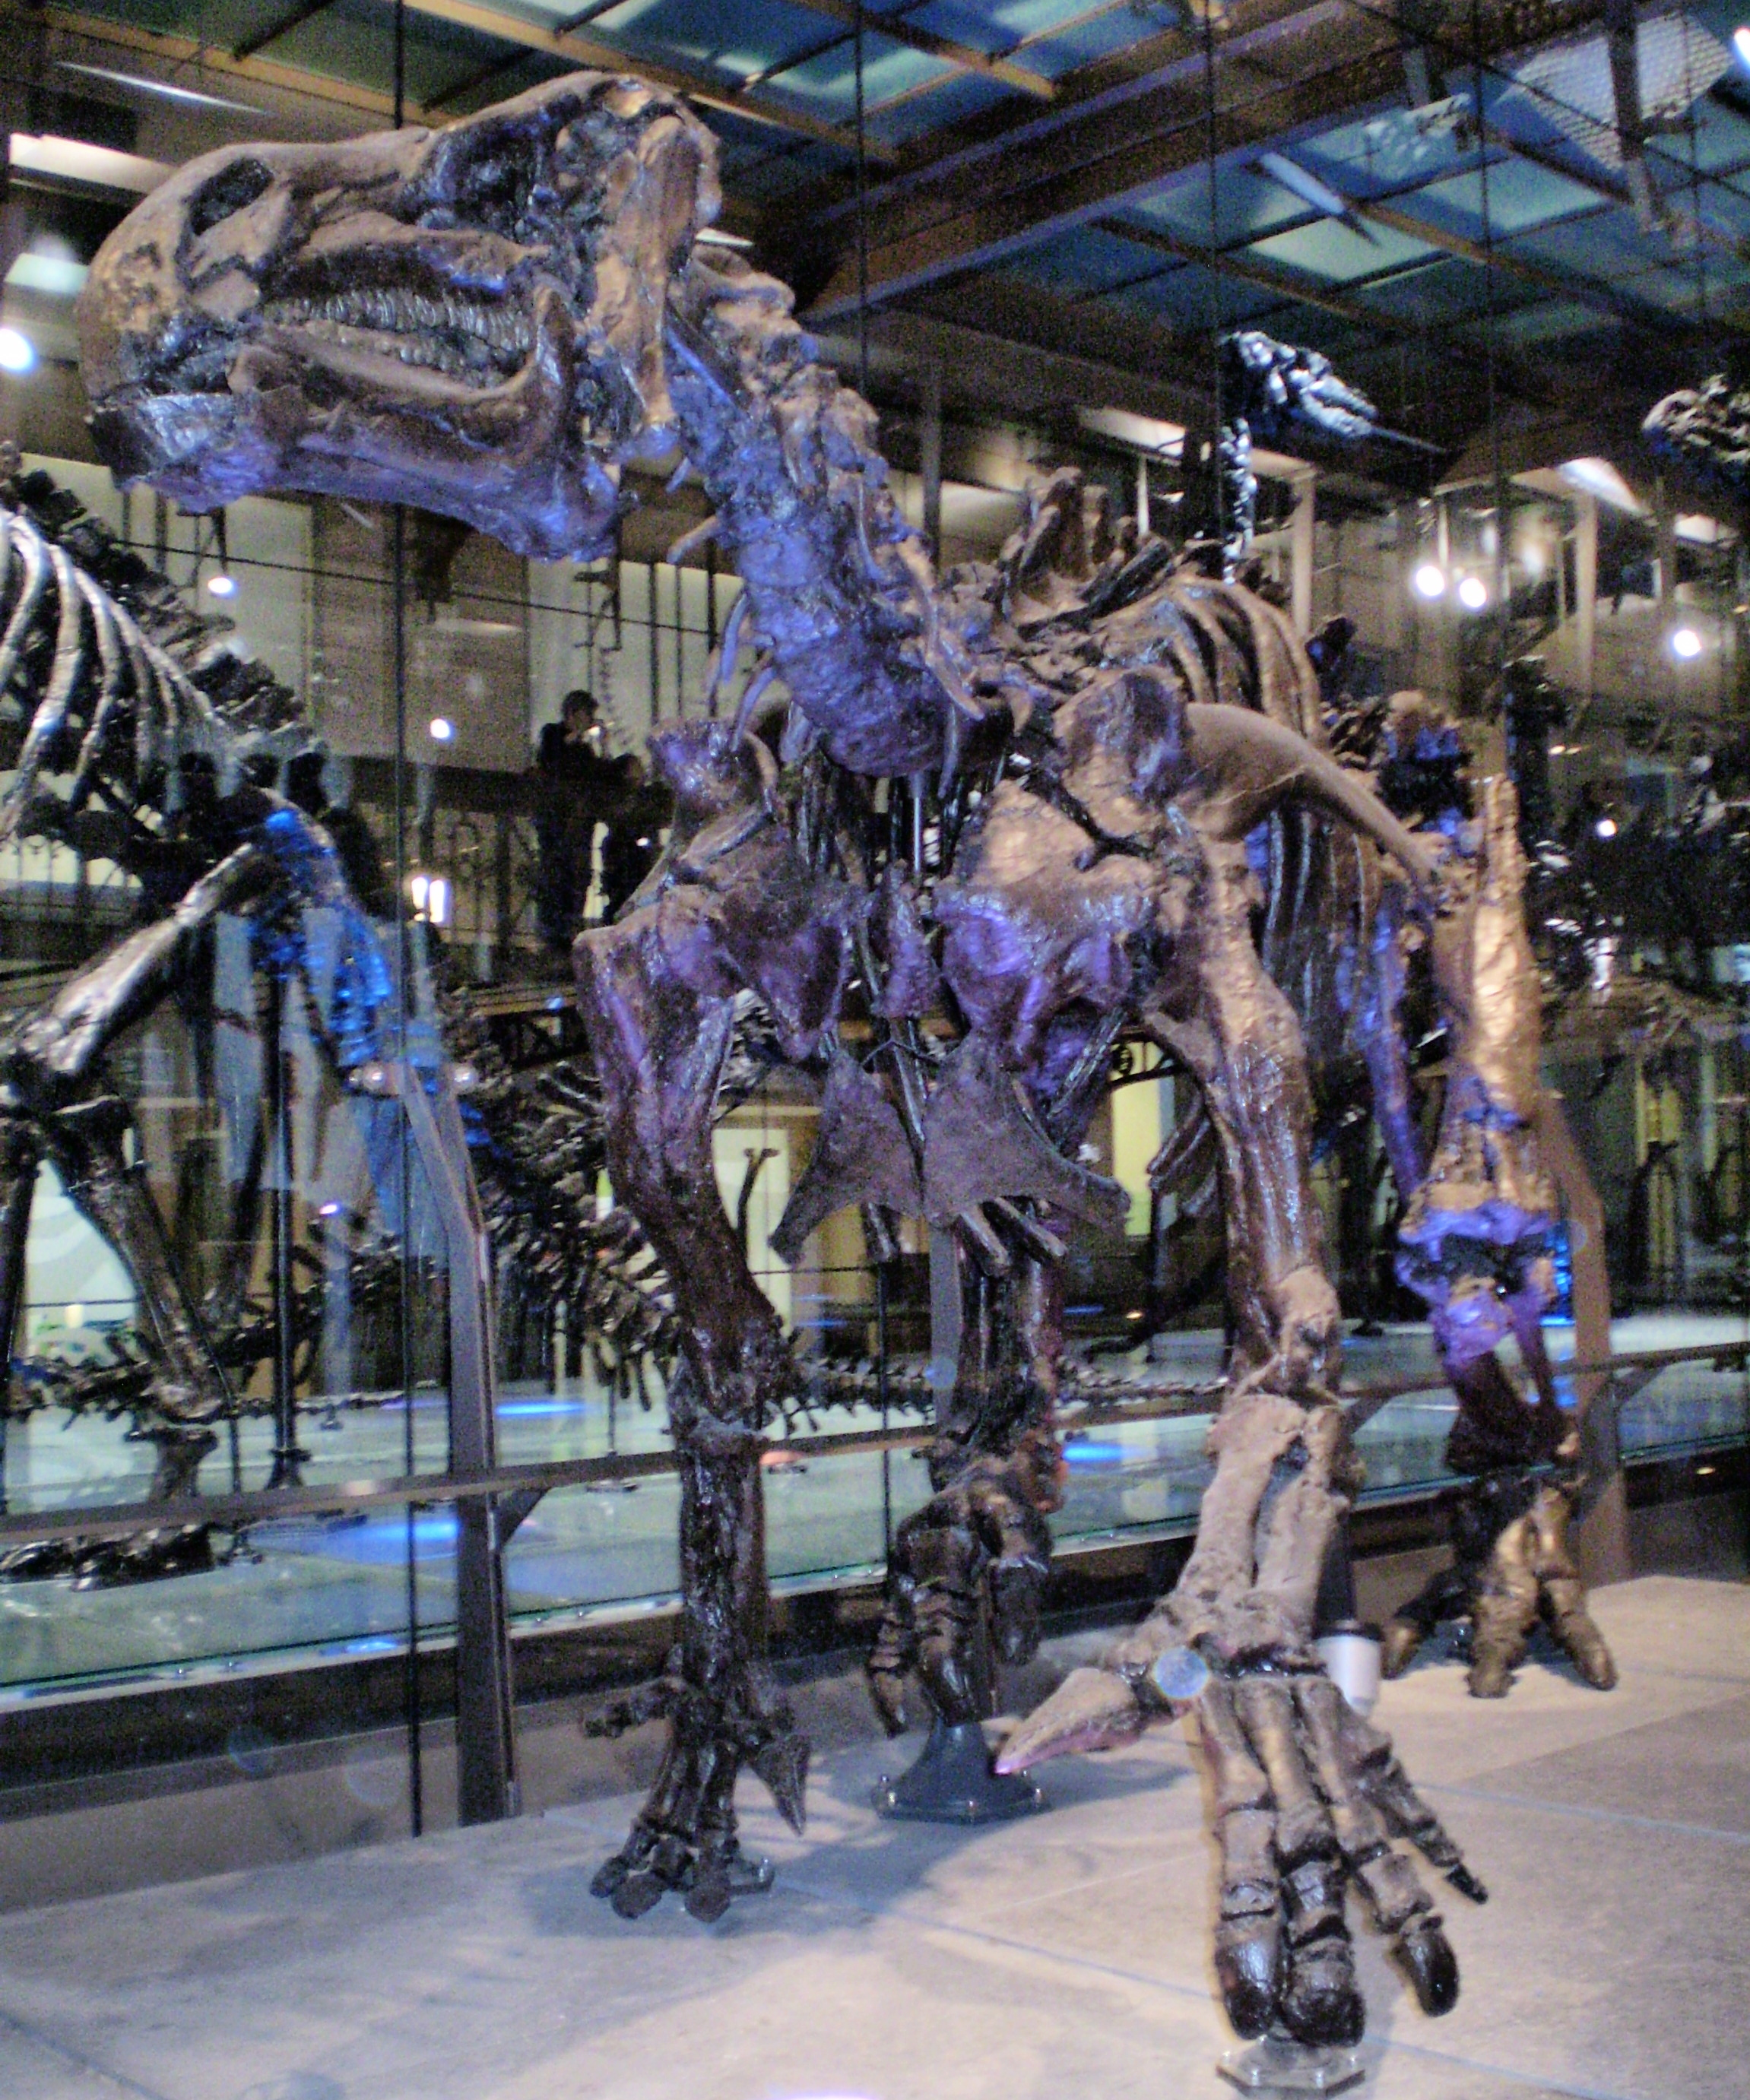 [Image: Iguanodon_de_Bernissart_IRSNB_01.JPG]